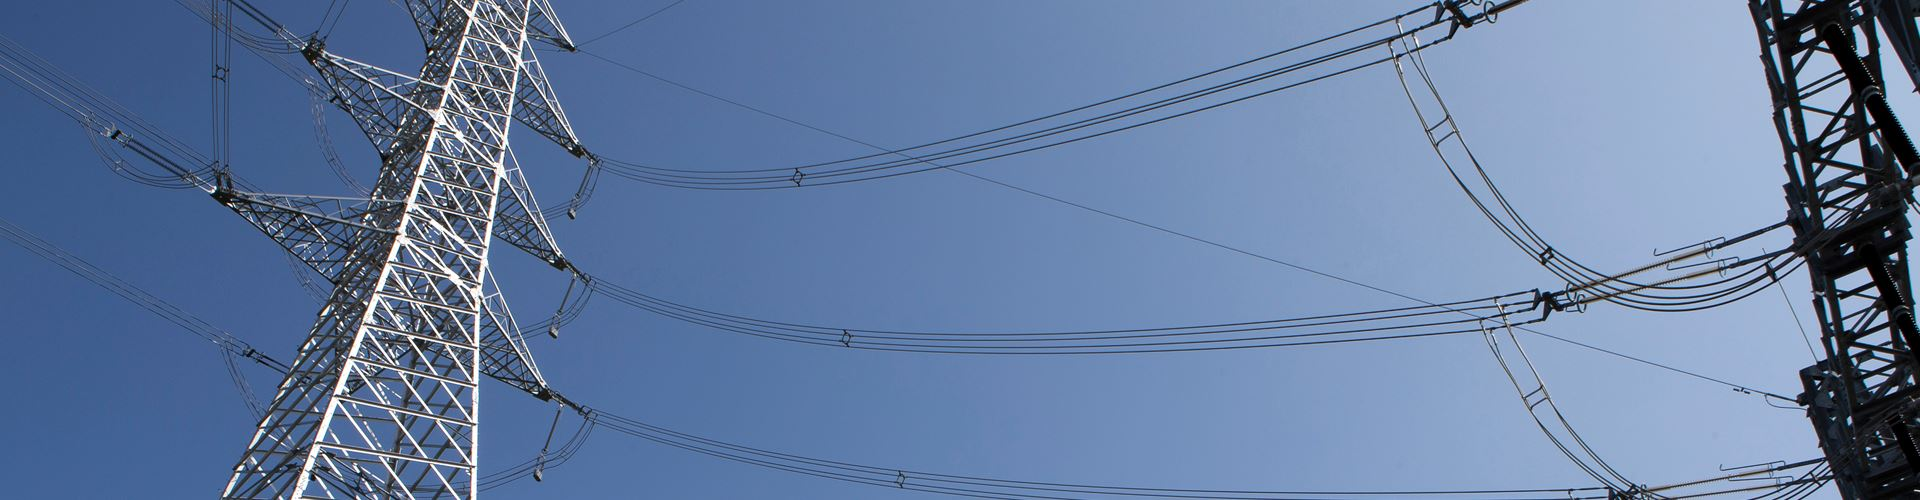 Transmission lines against a blue sky